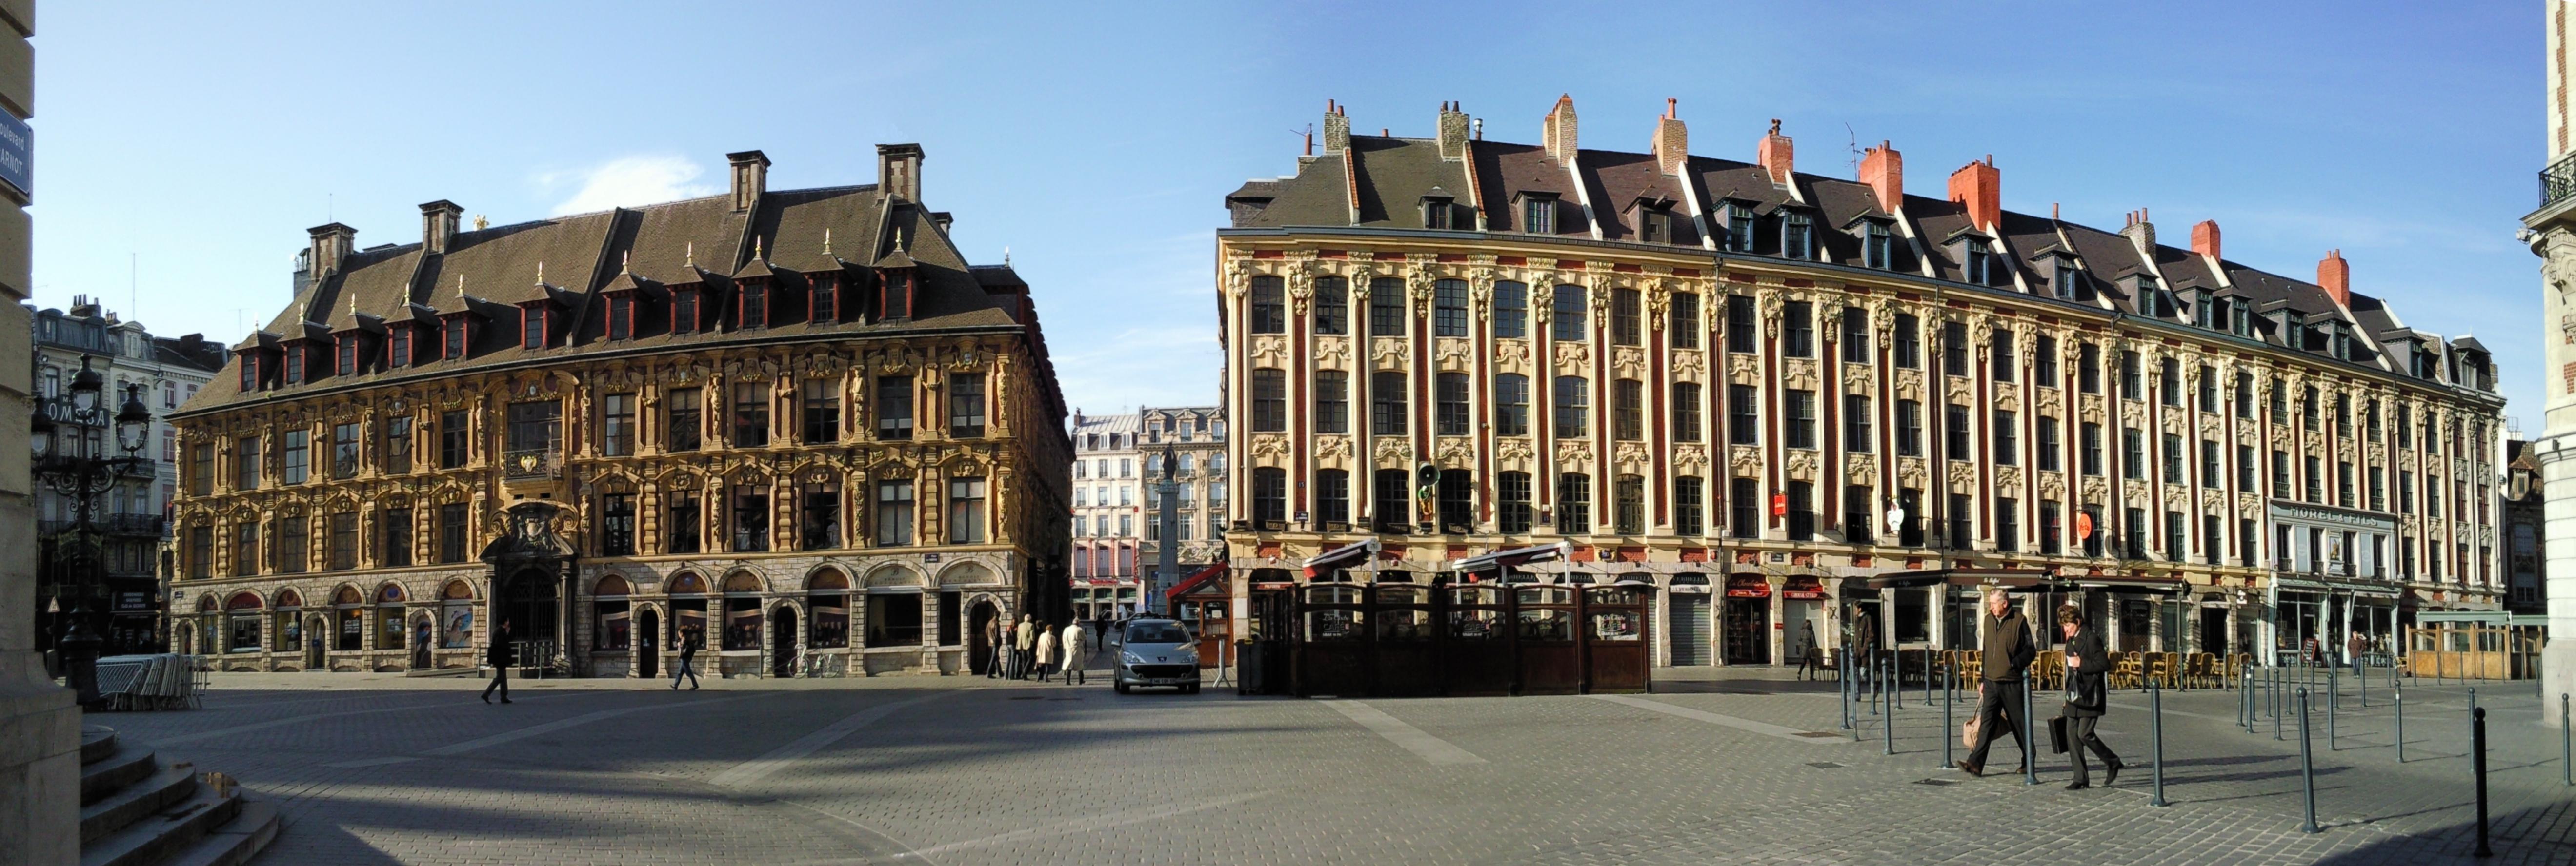 File:Lille place du théatre.jpg - Wikimedia Commons